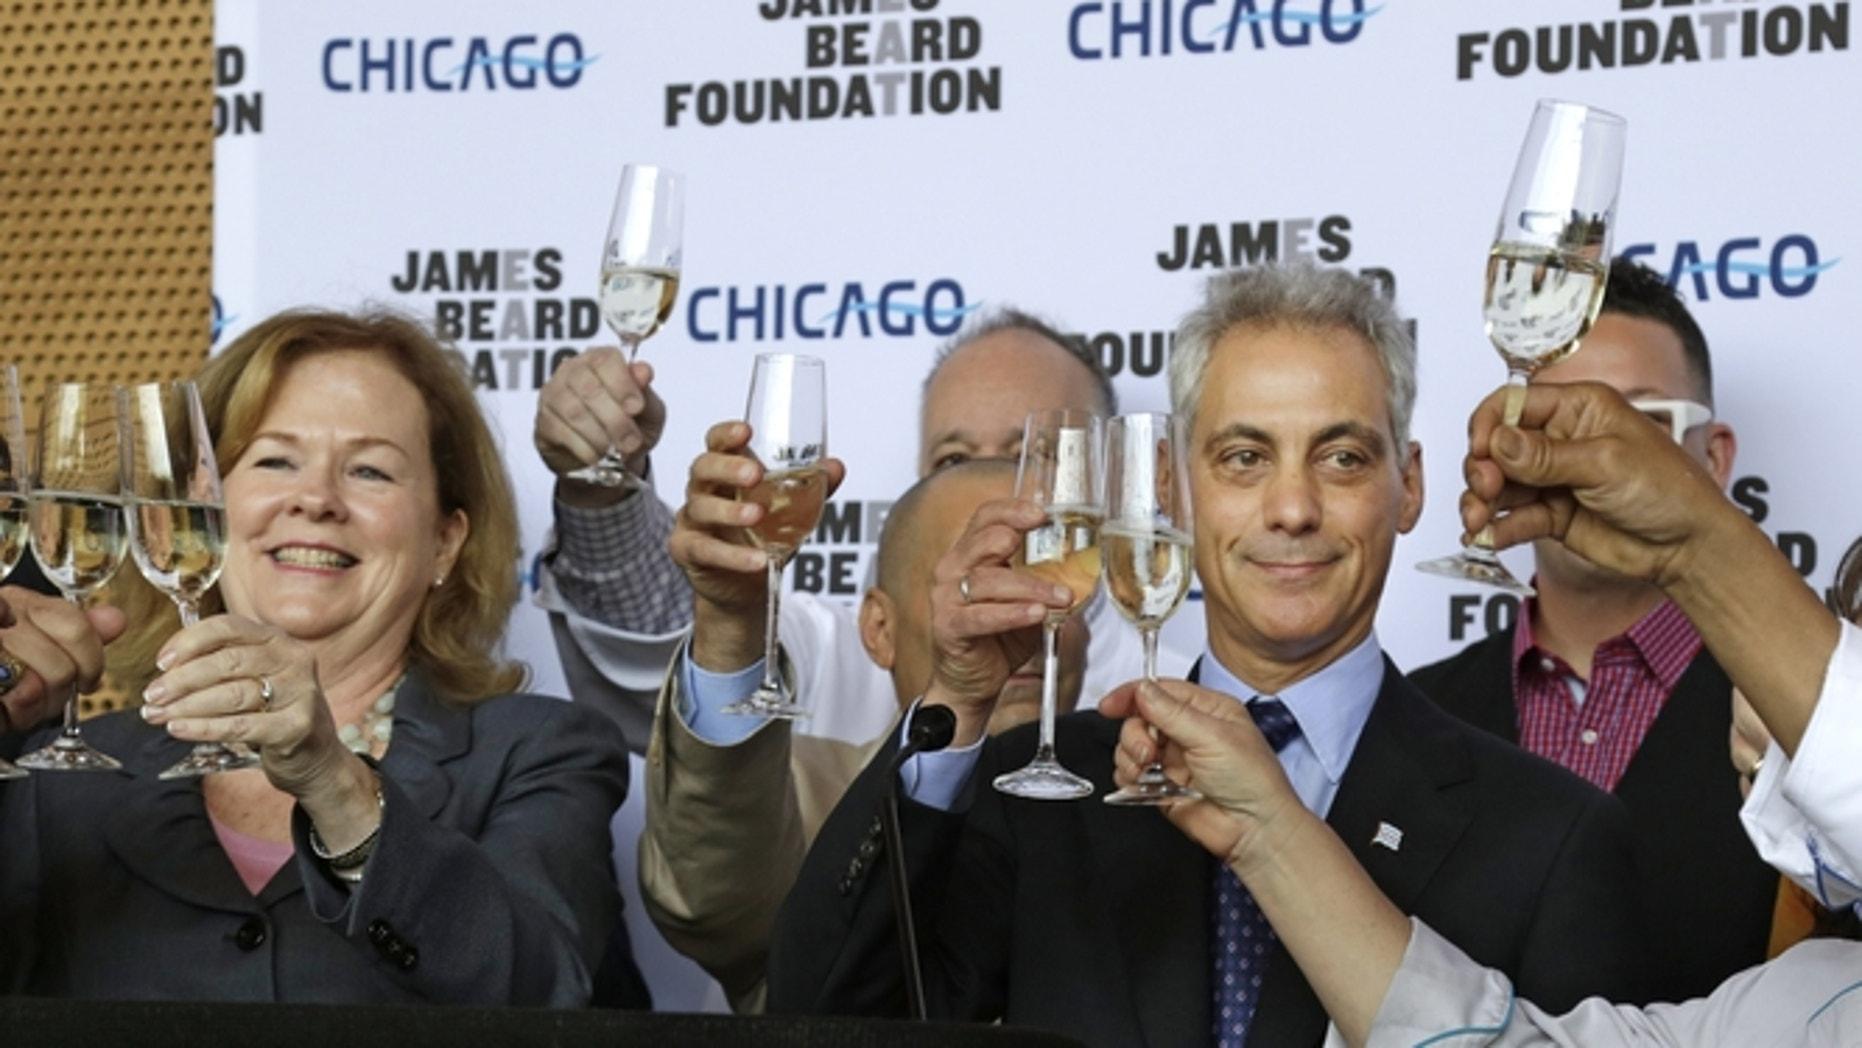 Susan Ungaro, President of the James Beard Foundation, left, and Chicago Mayor Rahm Emanuel, right, toast to the JBF Awards.